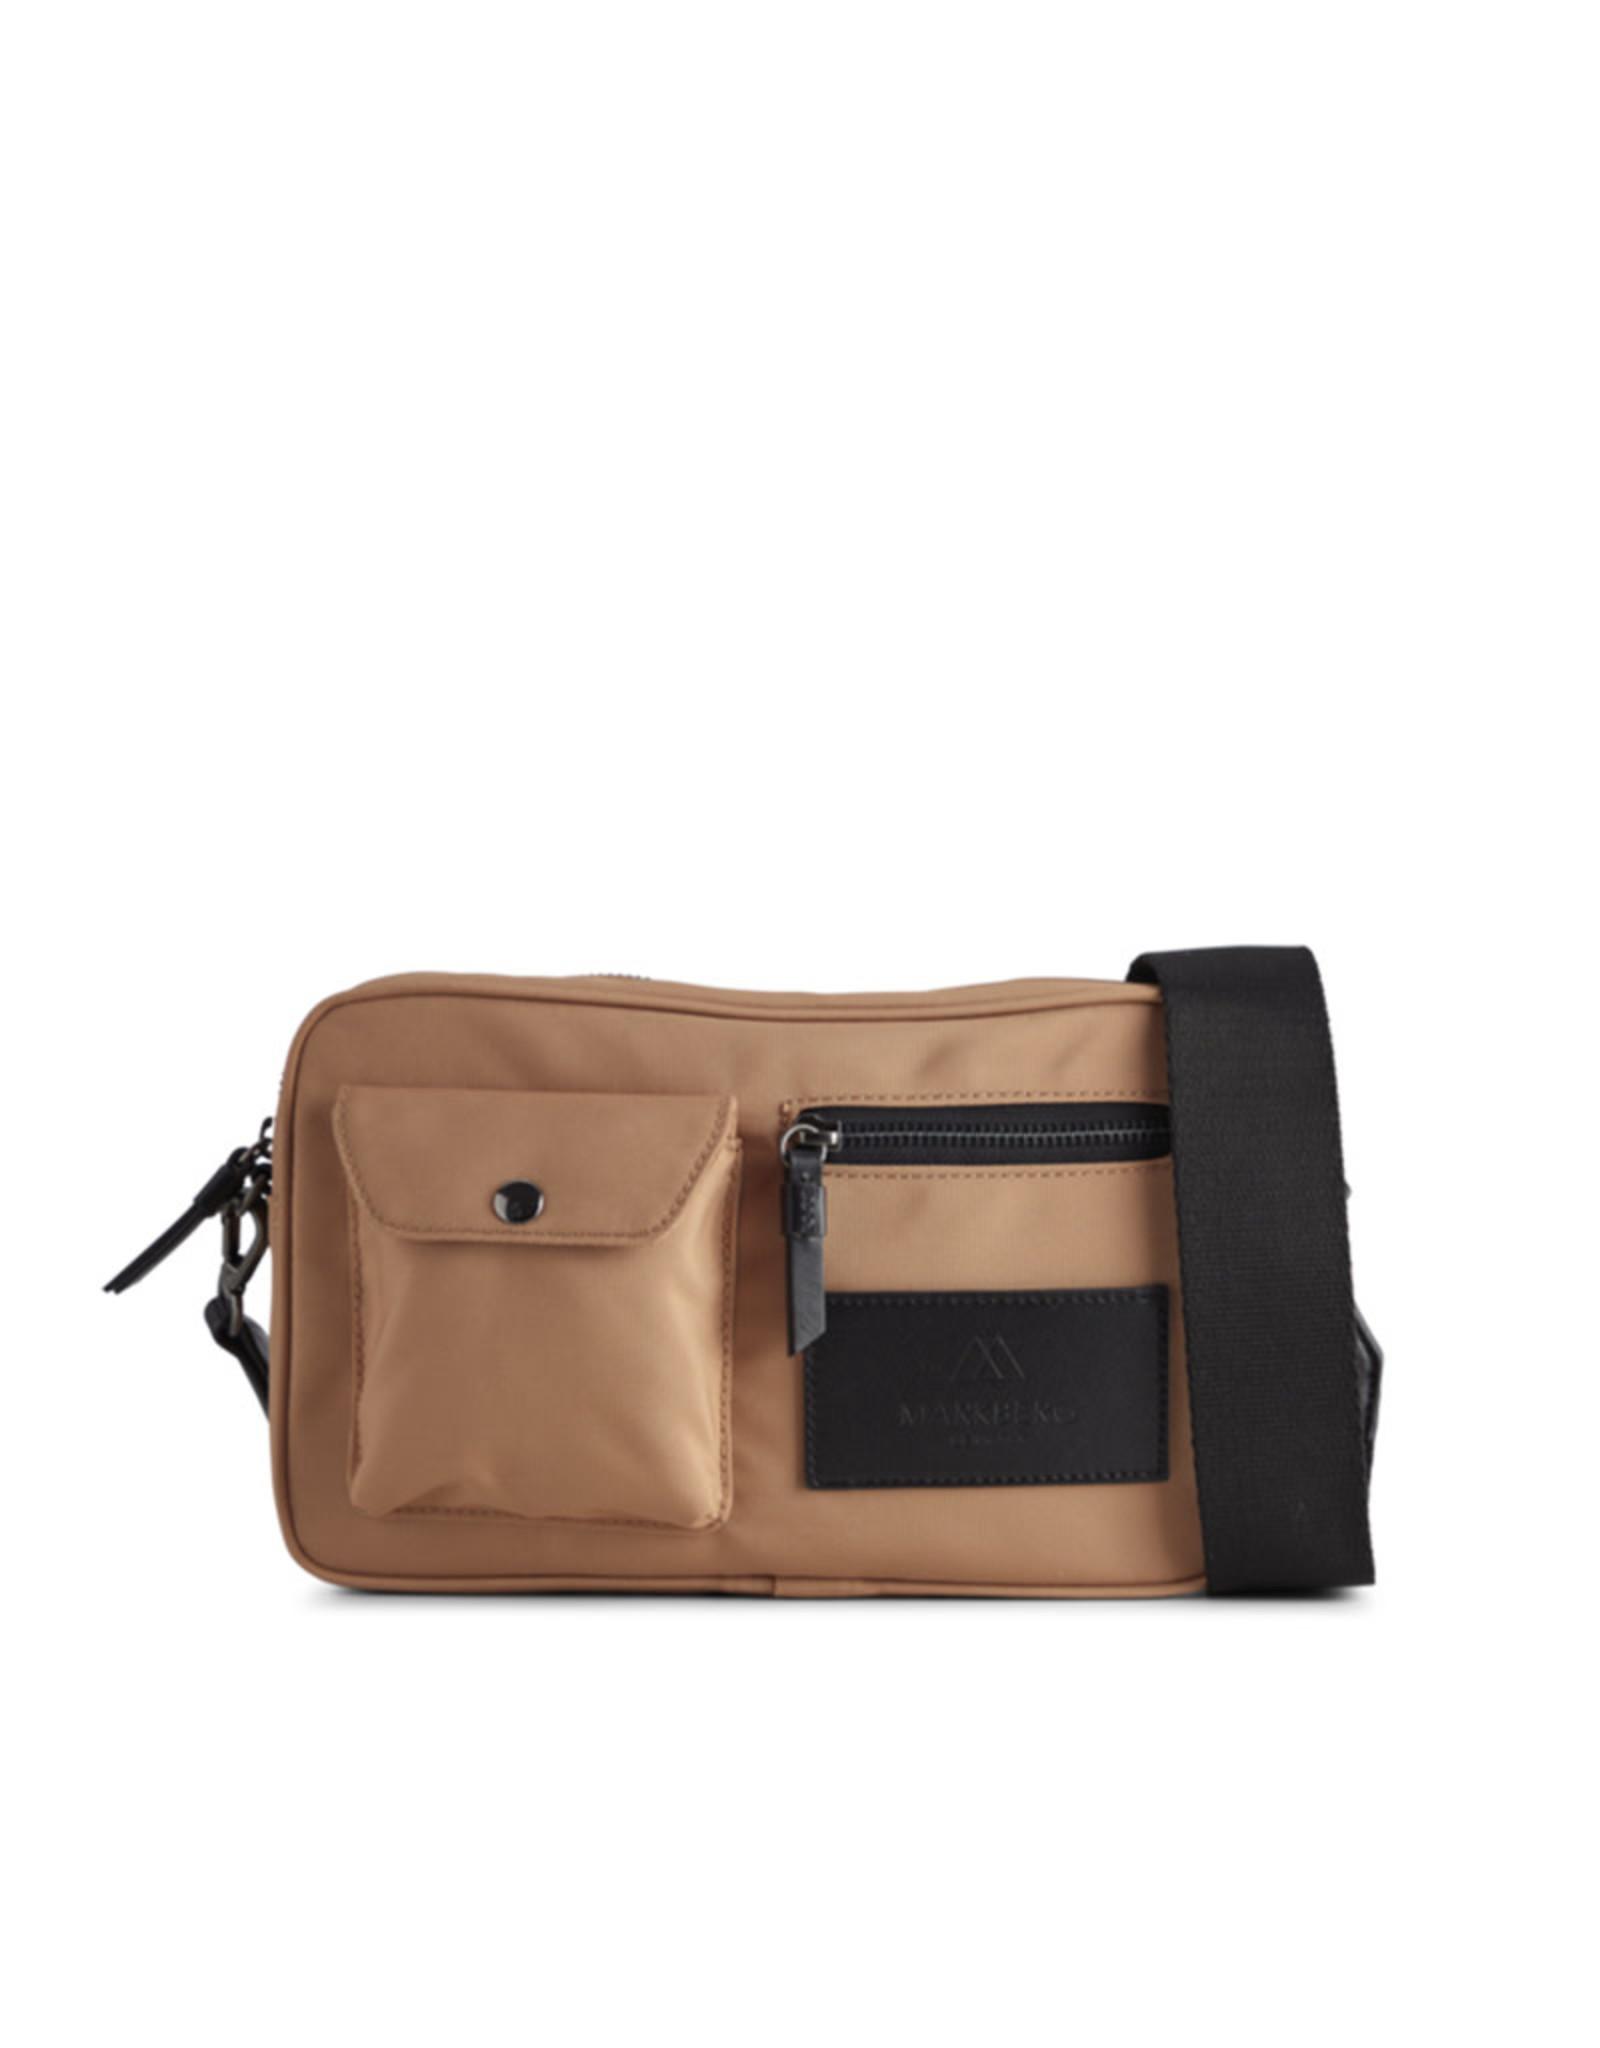 Markberg Darla Crossbody bag